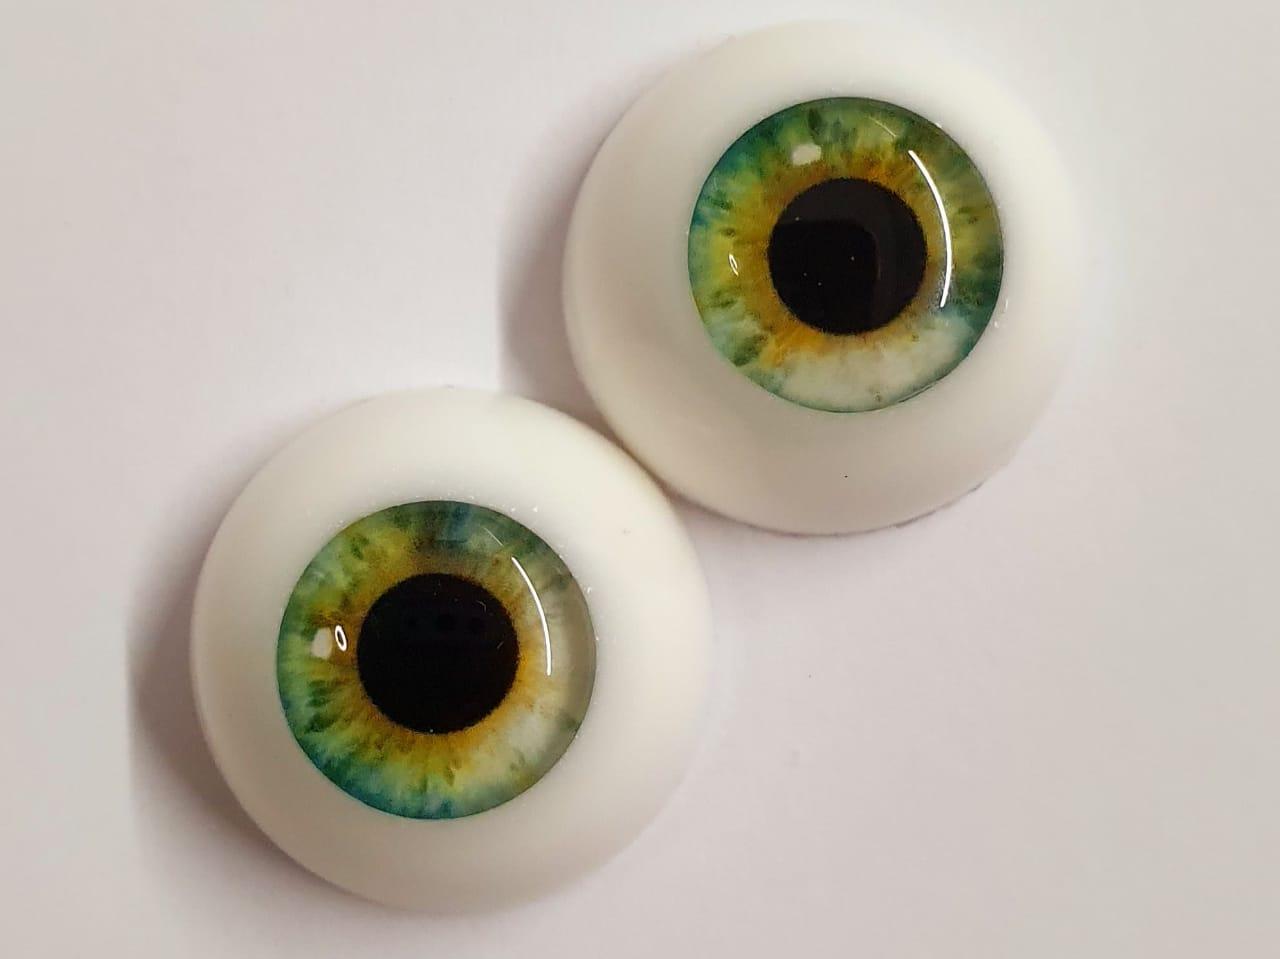 Olhos realistas verde claro 22 mm. cores exclusivas e raras